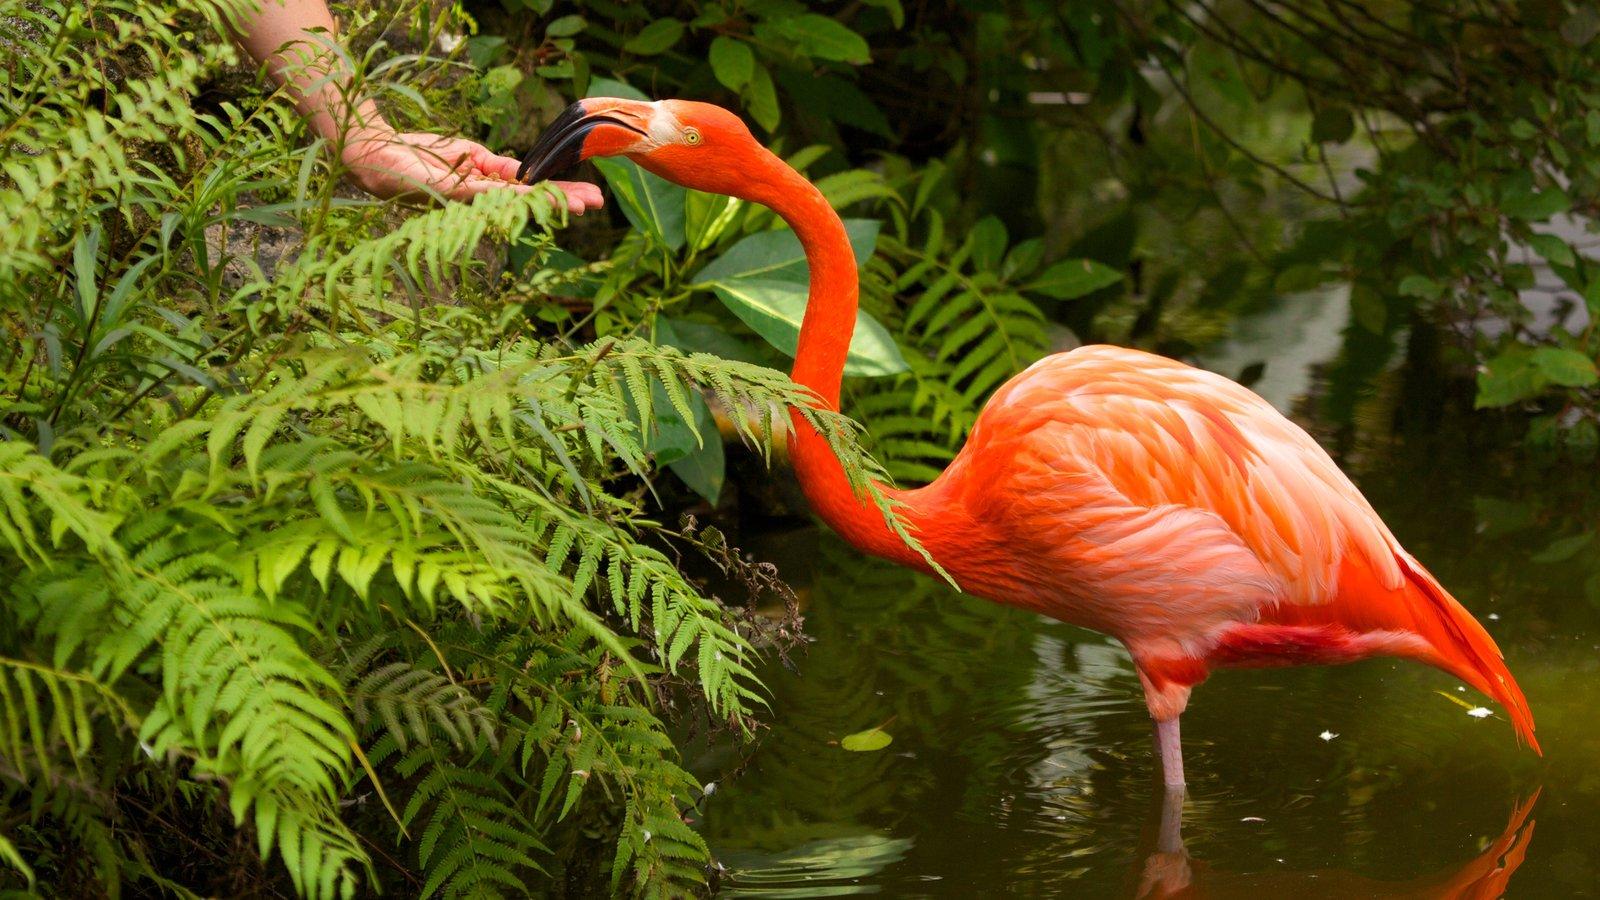 Flamingo Gardens which includes bird life